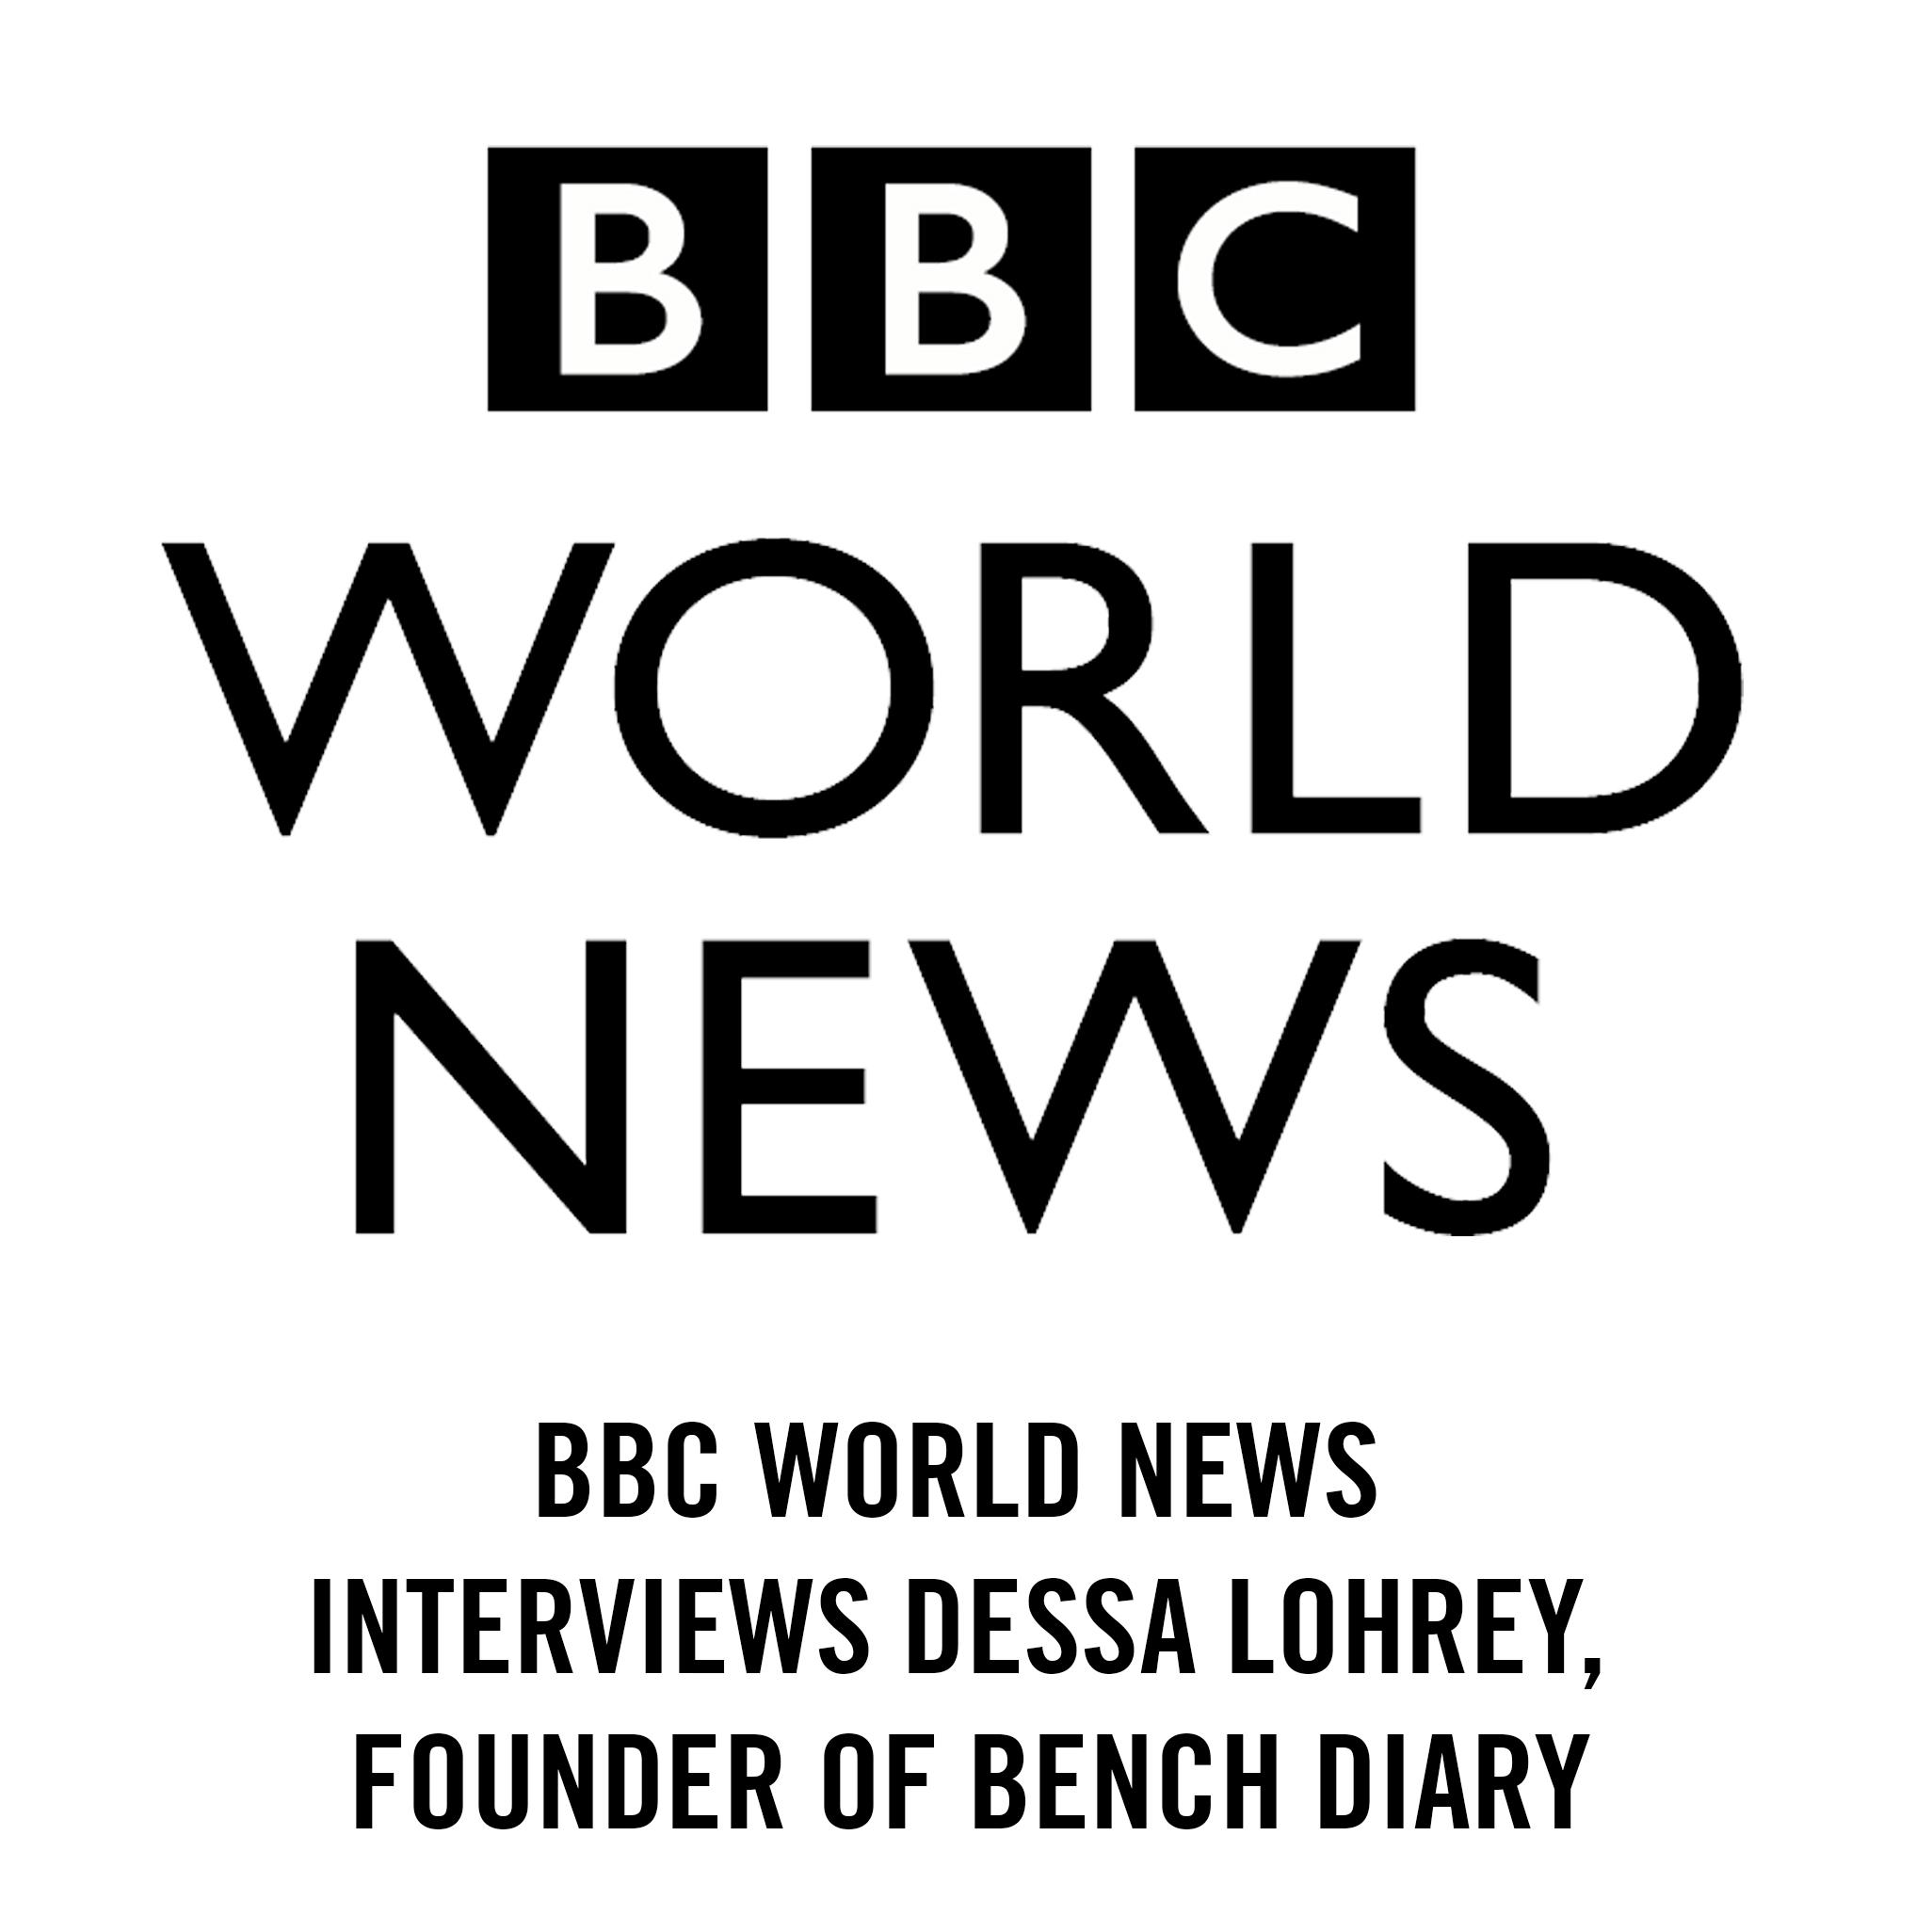 bbc press.jpg